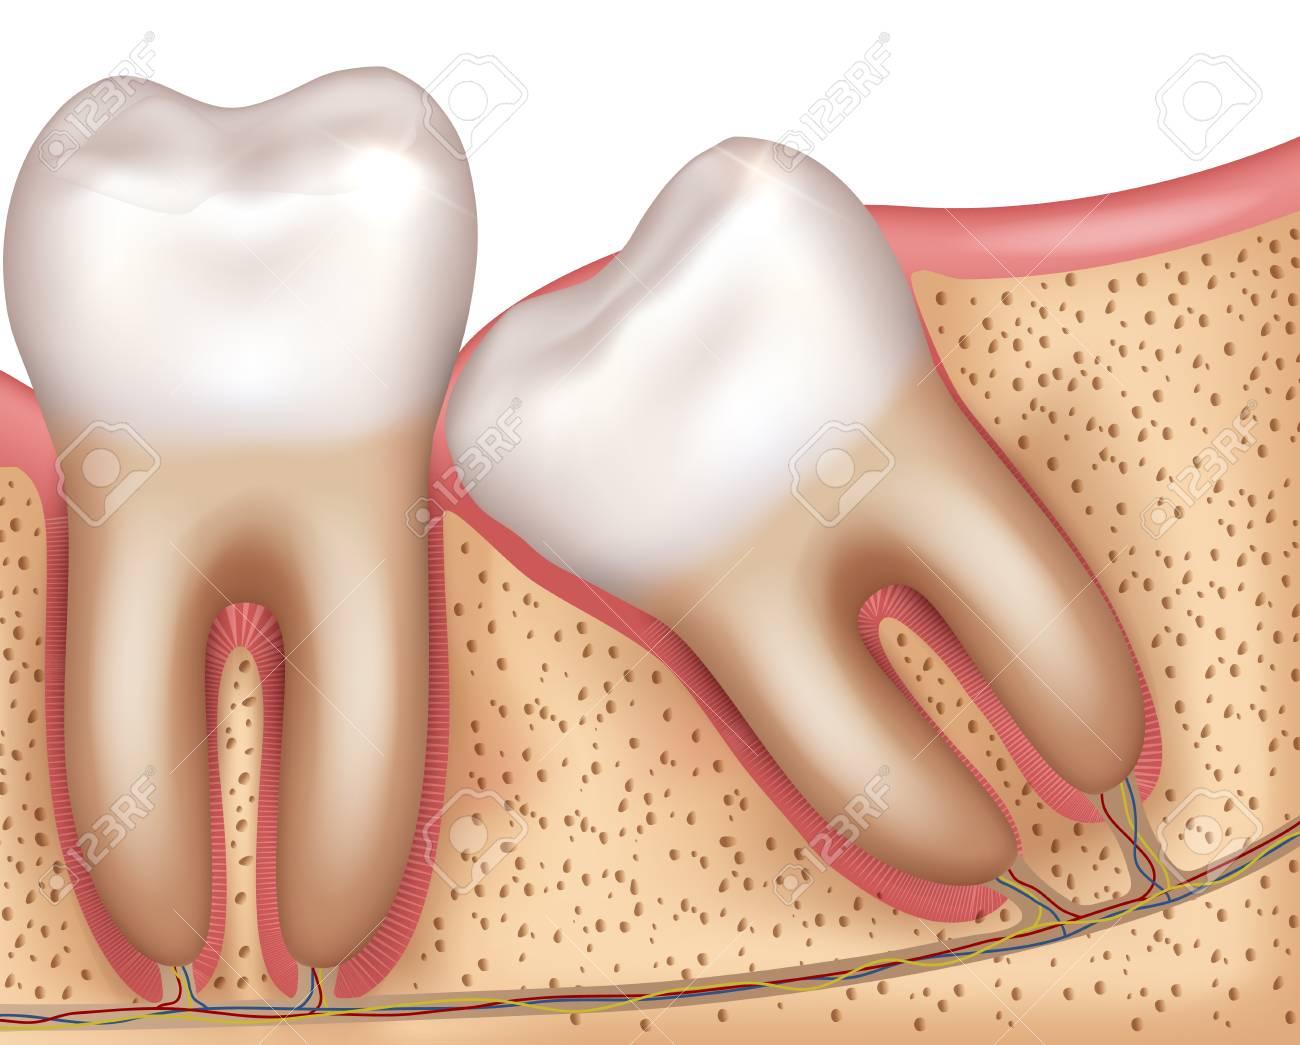 Wisdom tooth eruption problems illustrated anatomy - 126527324